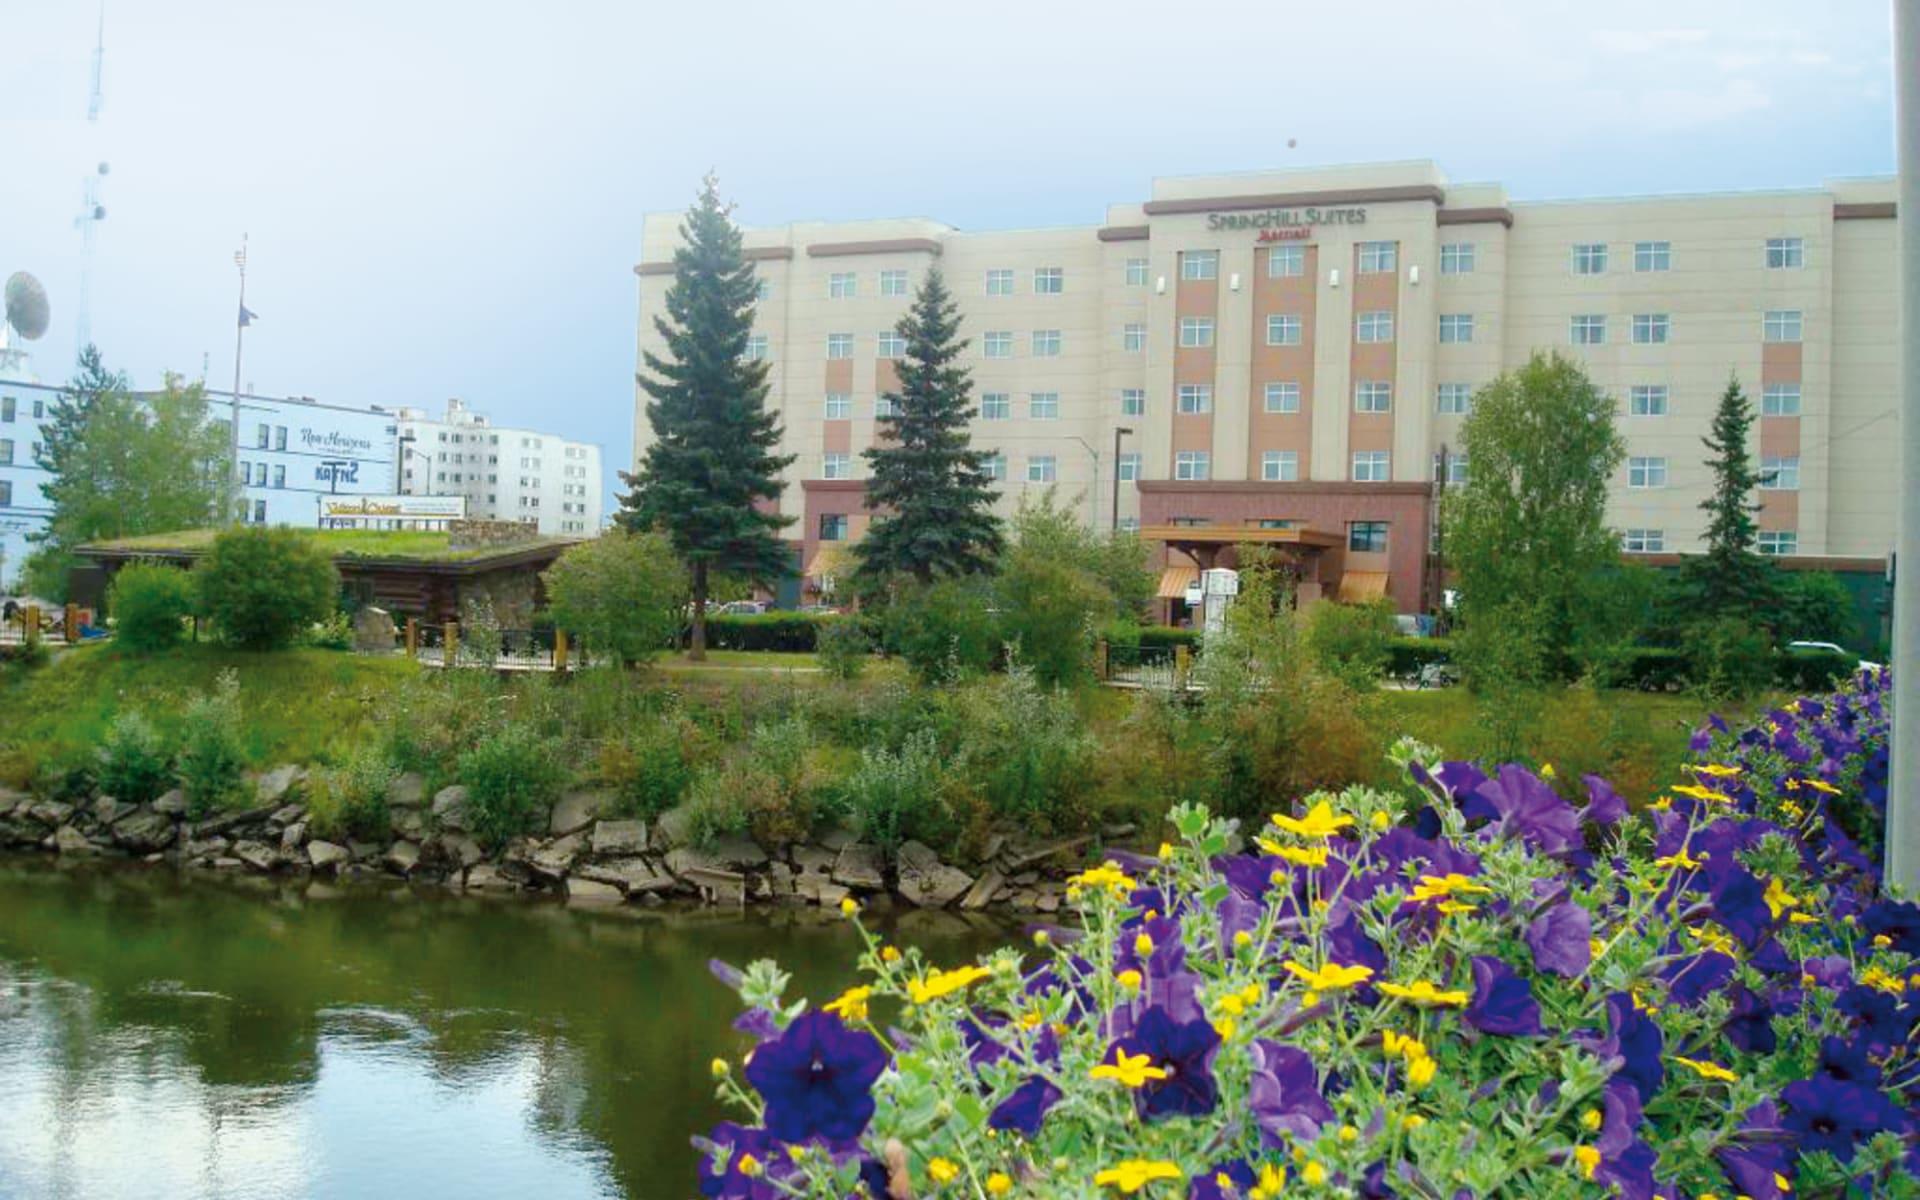 Springhill Suites Fairbanks:  2014_89_07_FairbanksSpringhillSuites